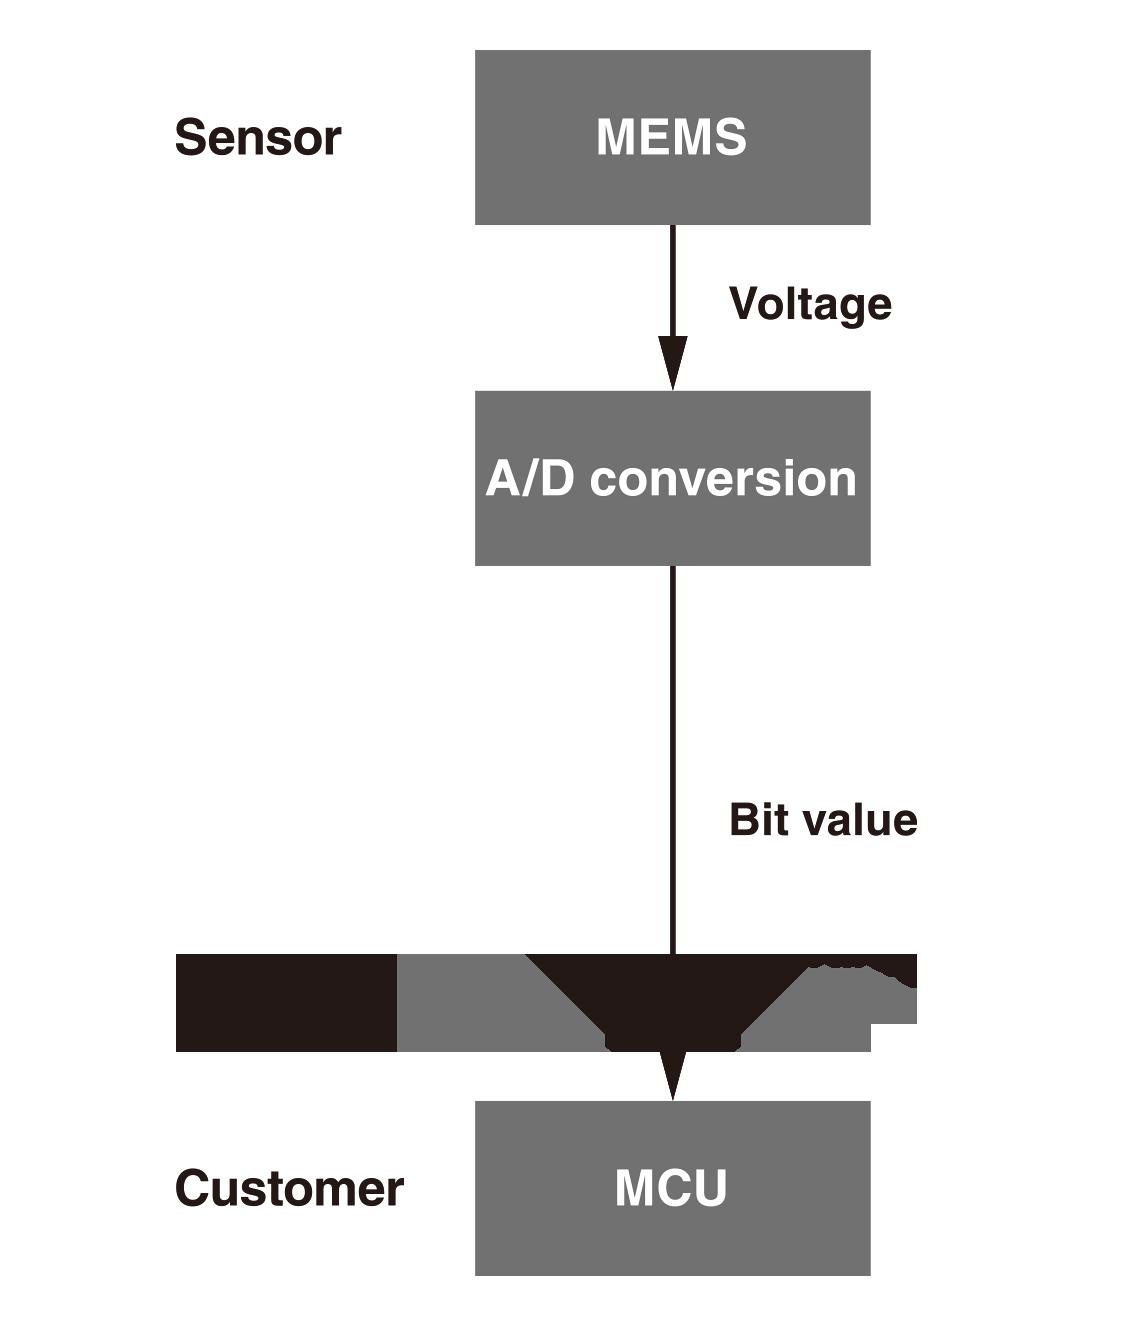 Sensor MEMS(Voltage) -> A/D conversion(Bit value) -> Customer MCU